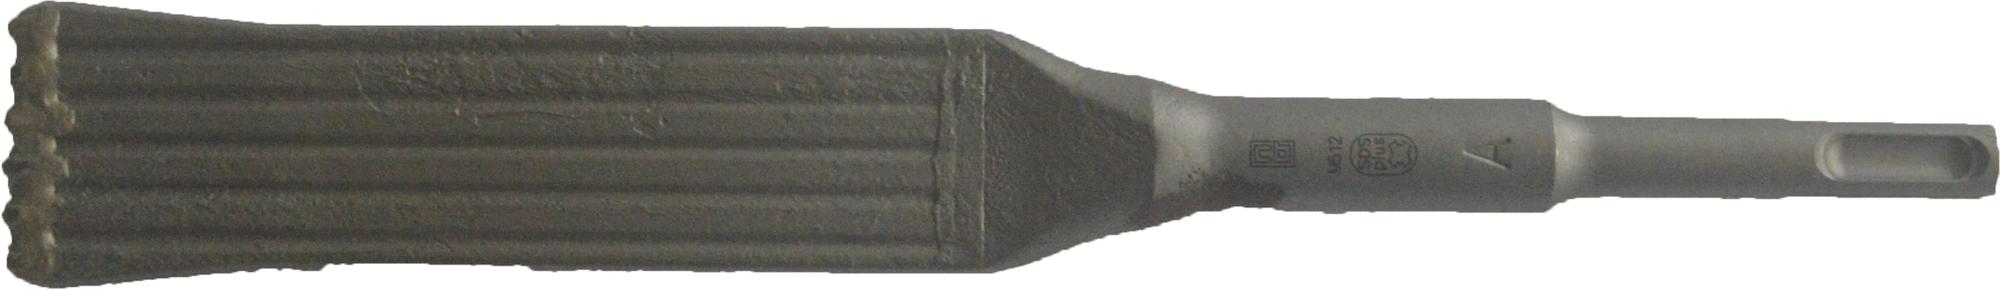 Voegenbeitel 8 mm SDS-Plus lang (economy)